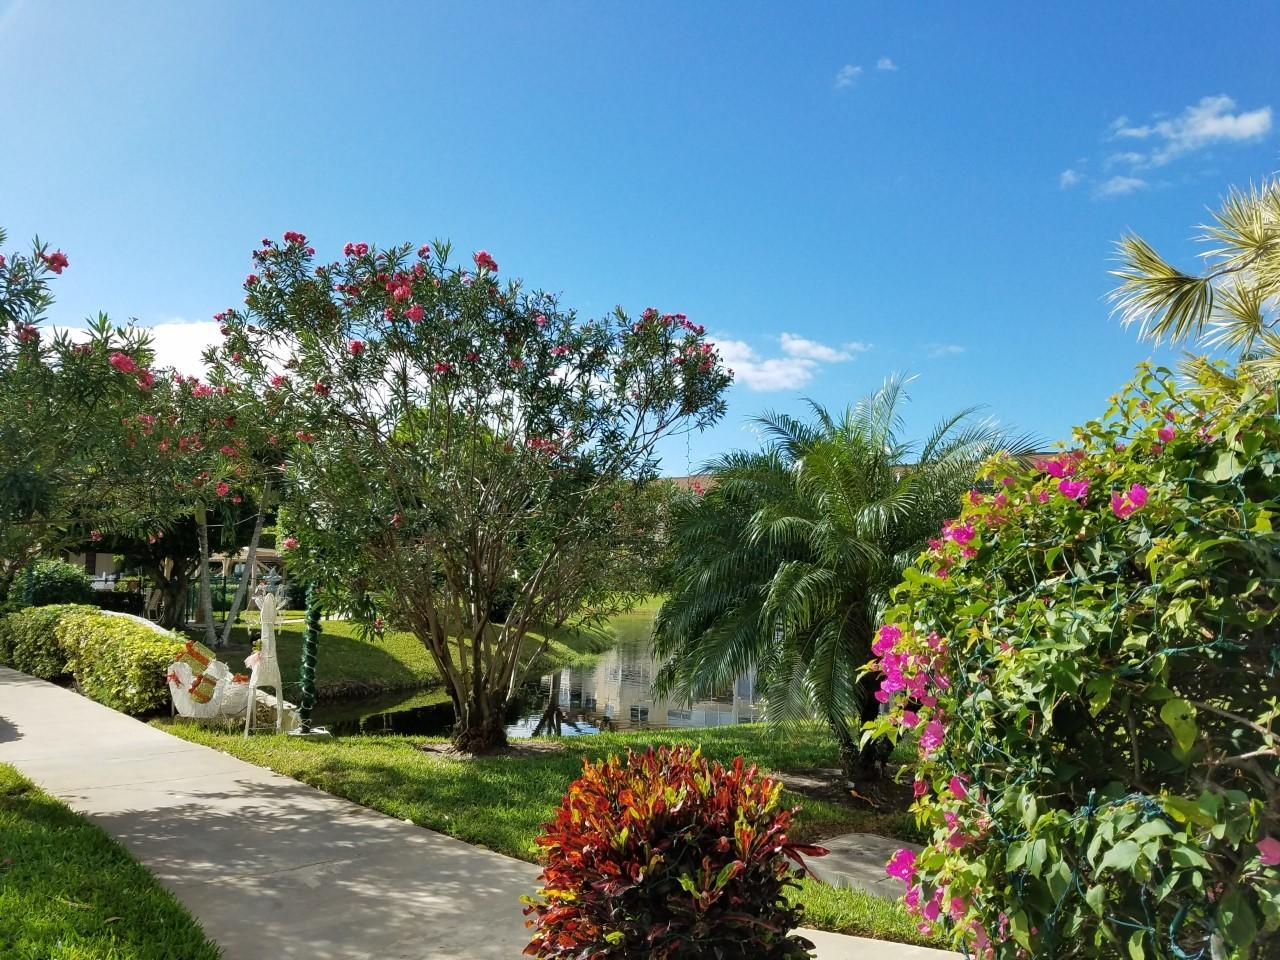 4700 Nw 35th Street, Lauderdale Lakes, FL 33319